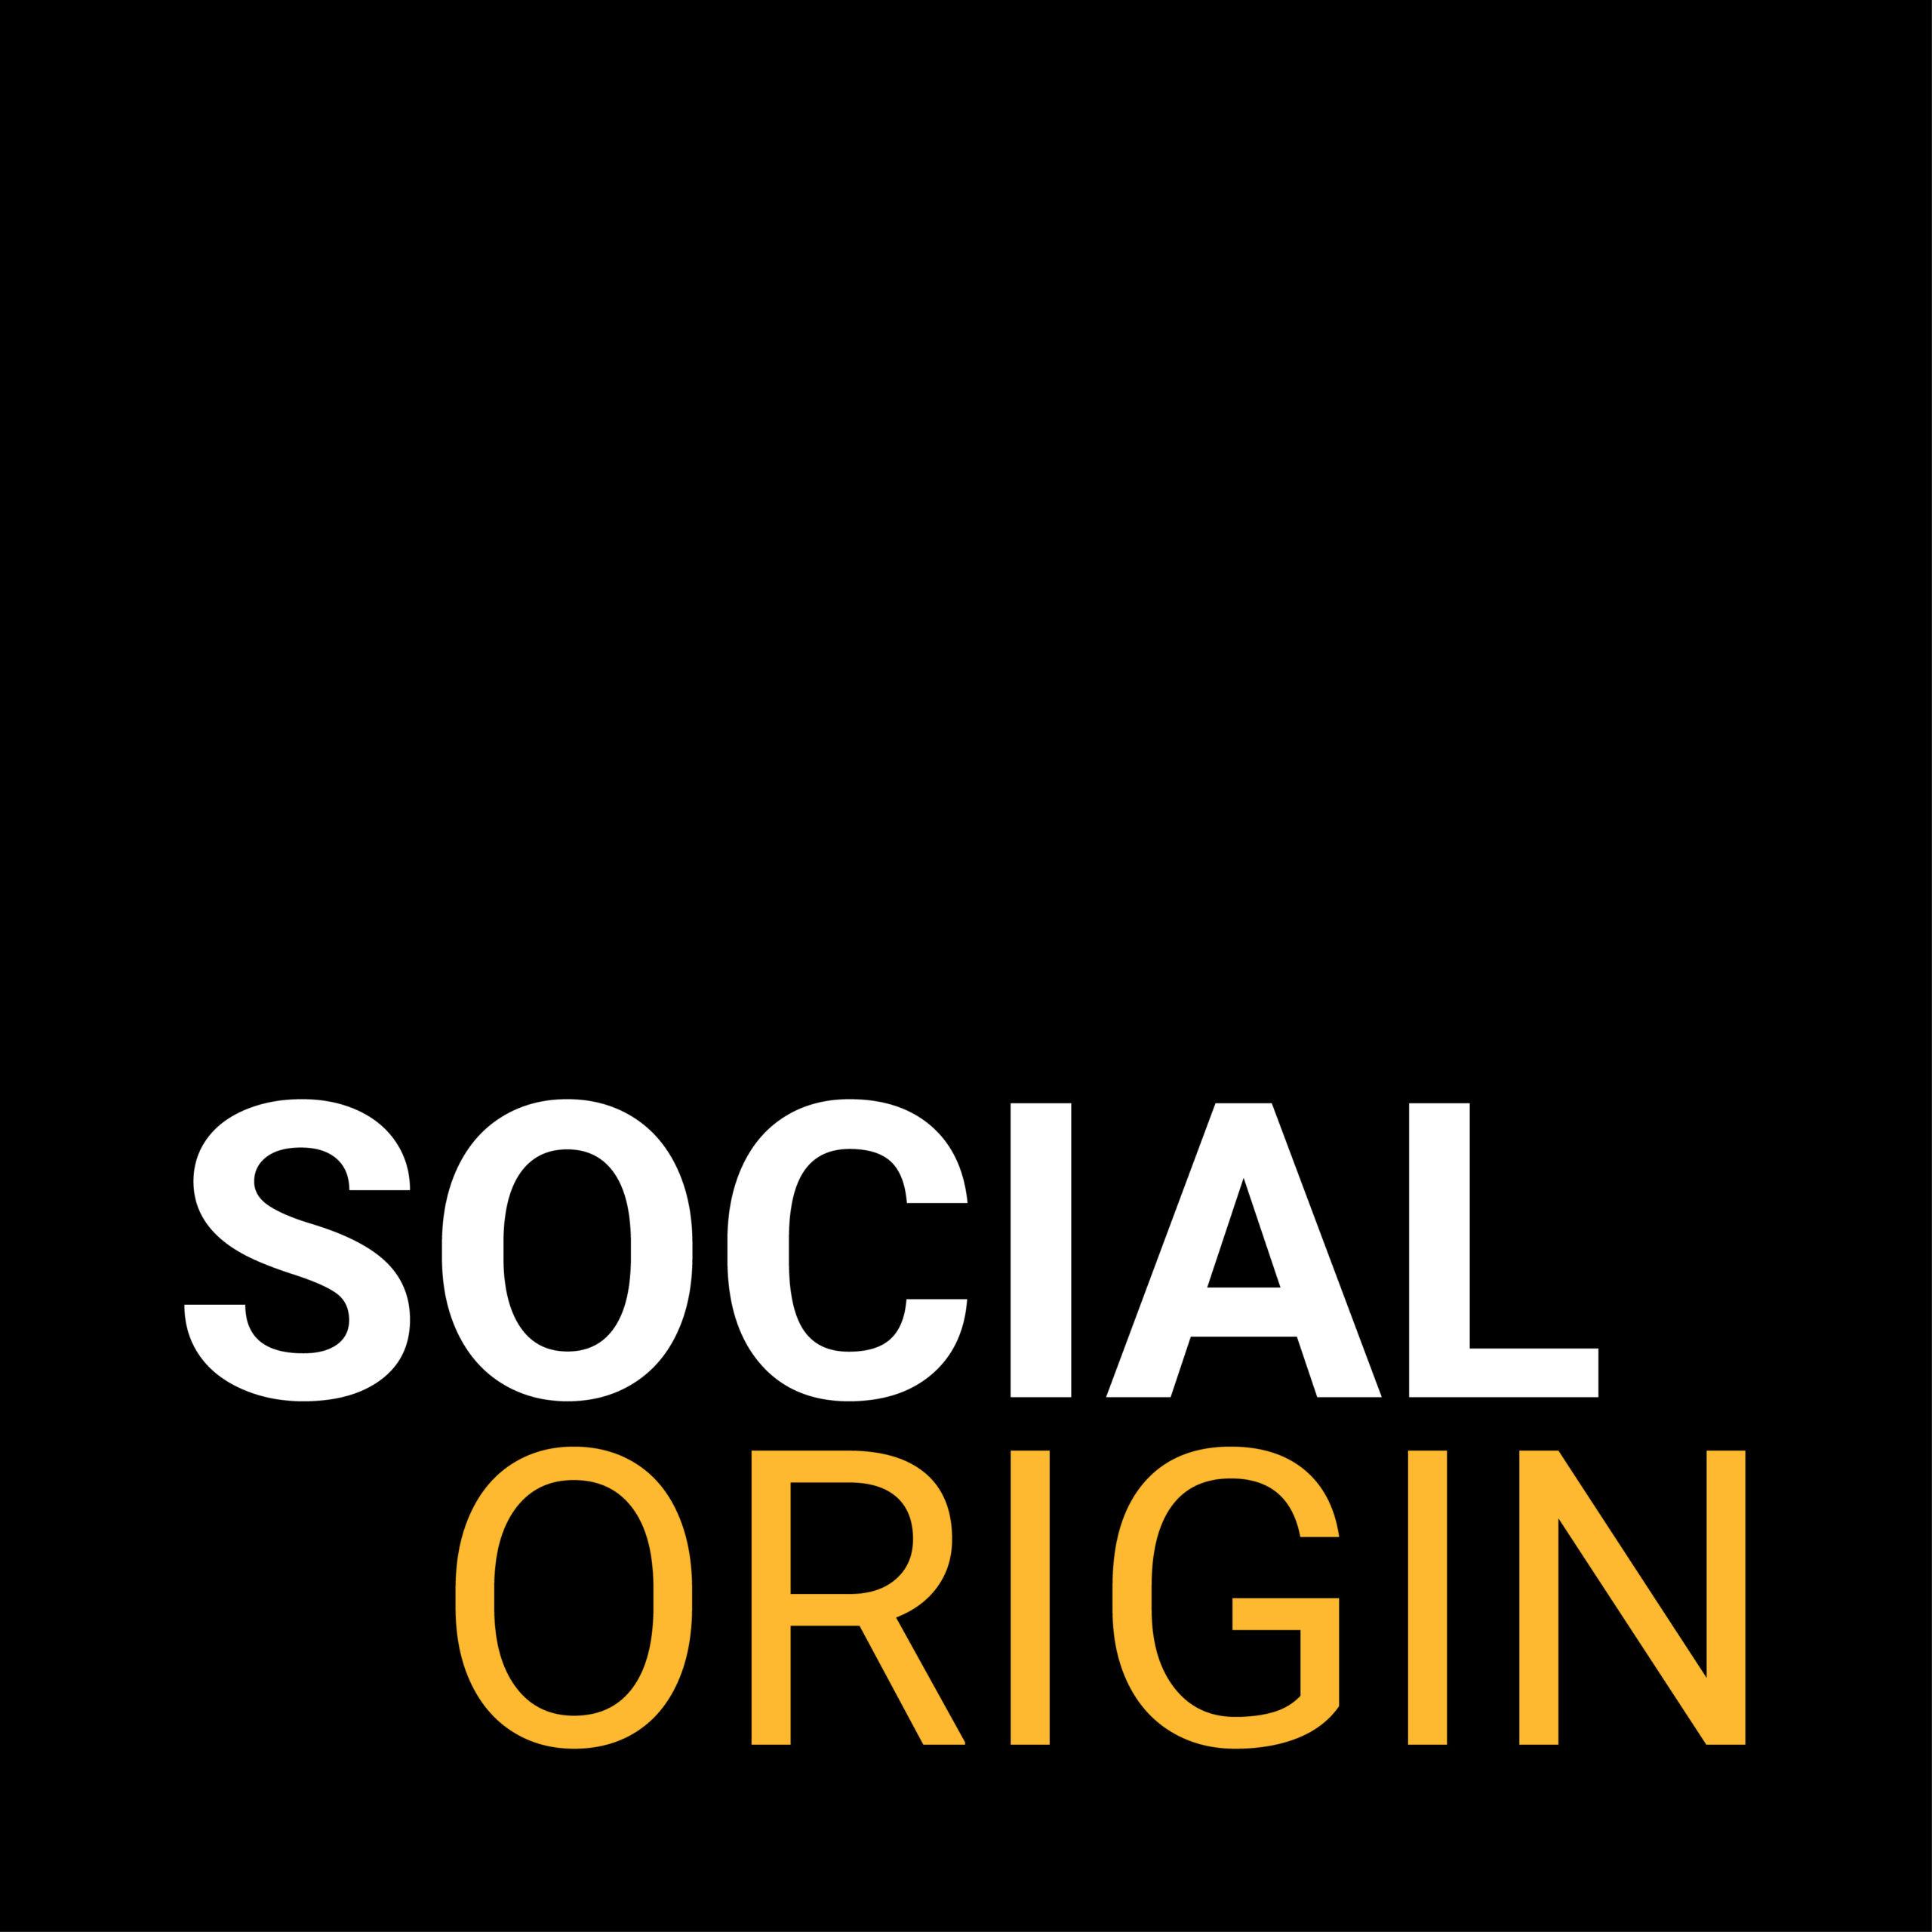 Social Origin